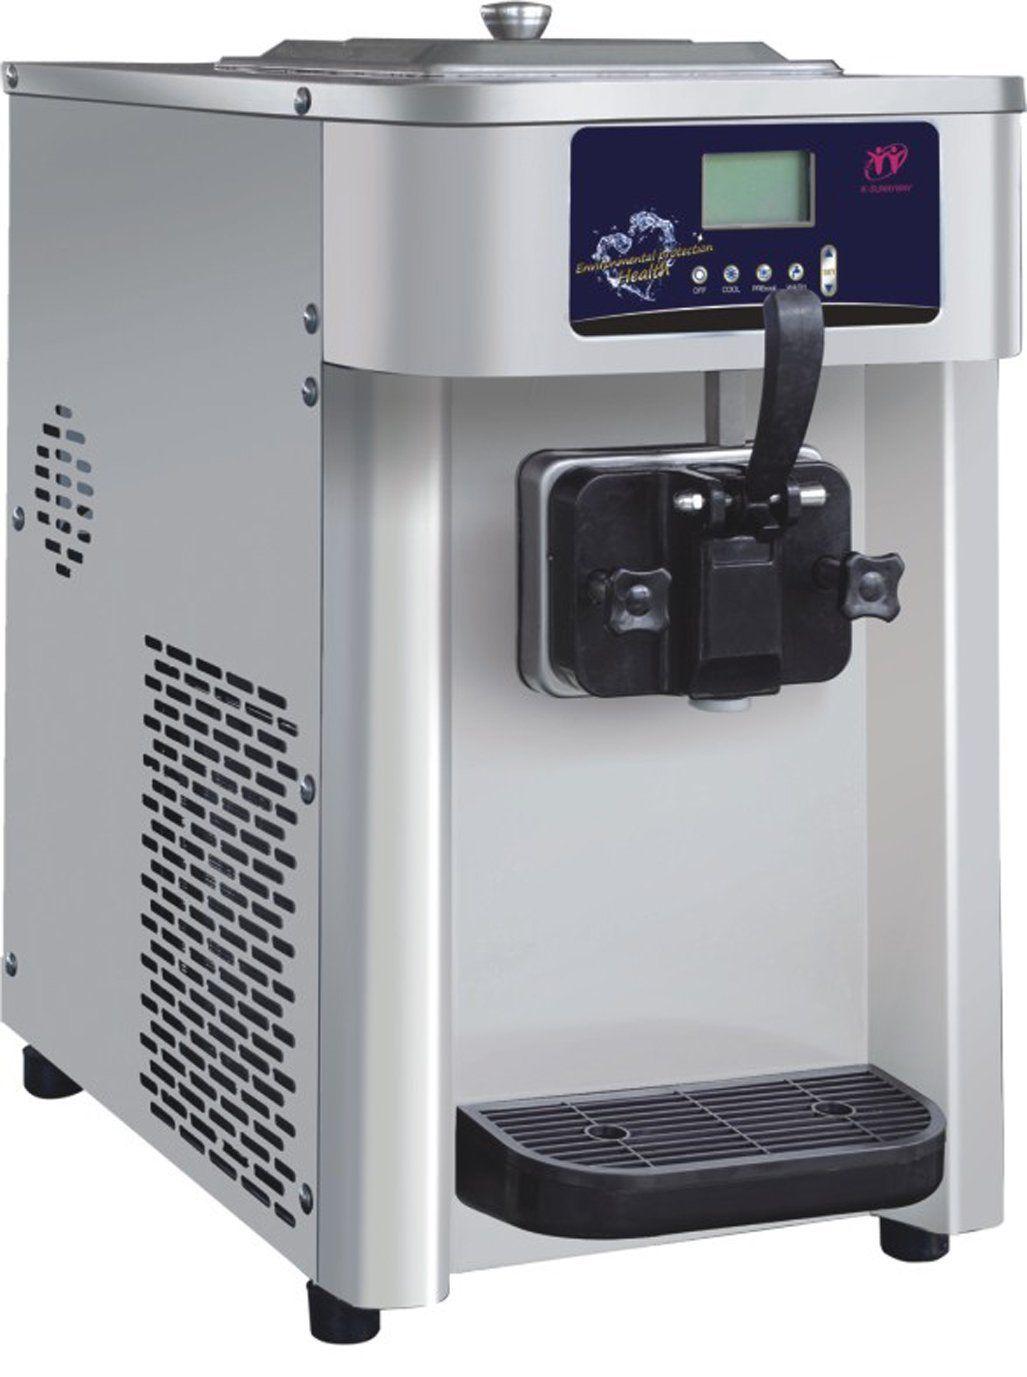 drawing of soft serve ice cream machine for home kitchen design ideas pinterest ice cream. Black Bedroom Furniture Sets. Home Design Ideas